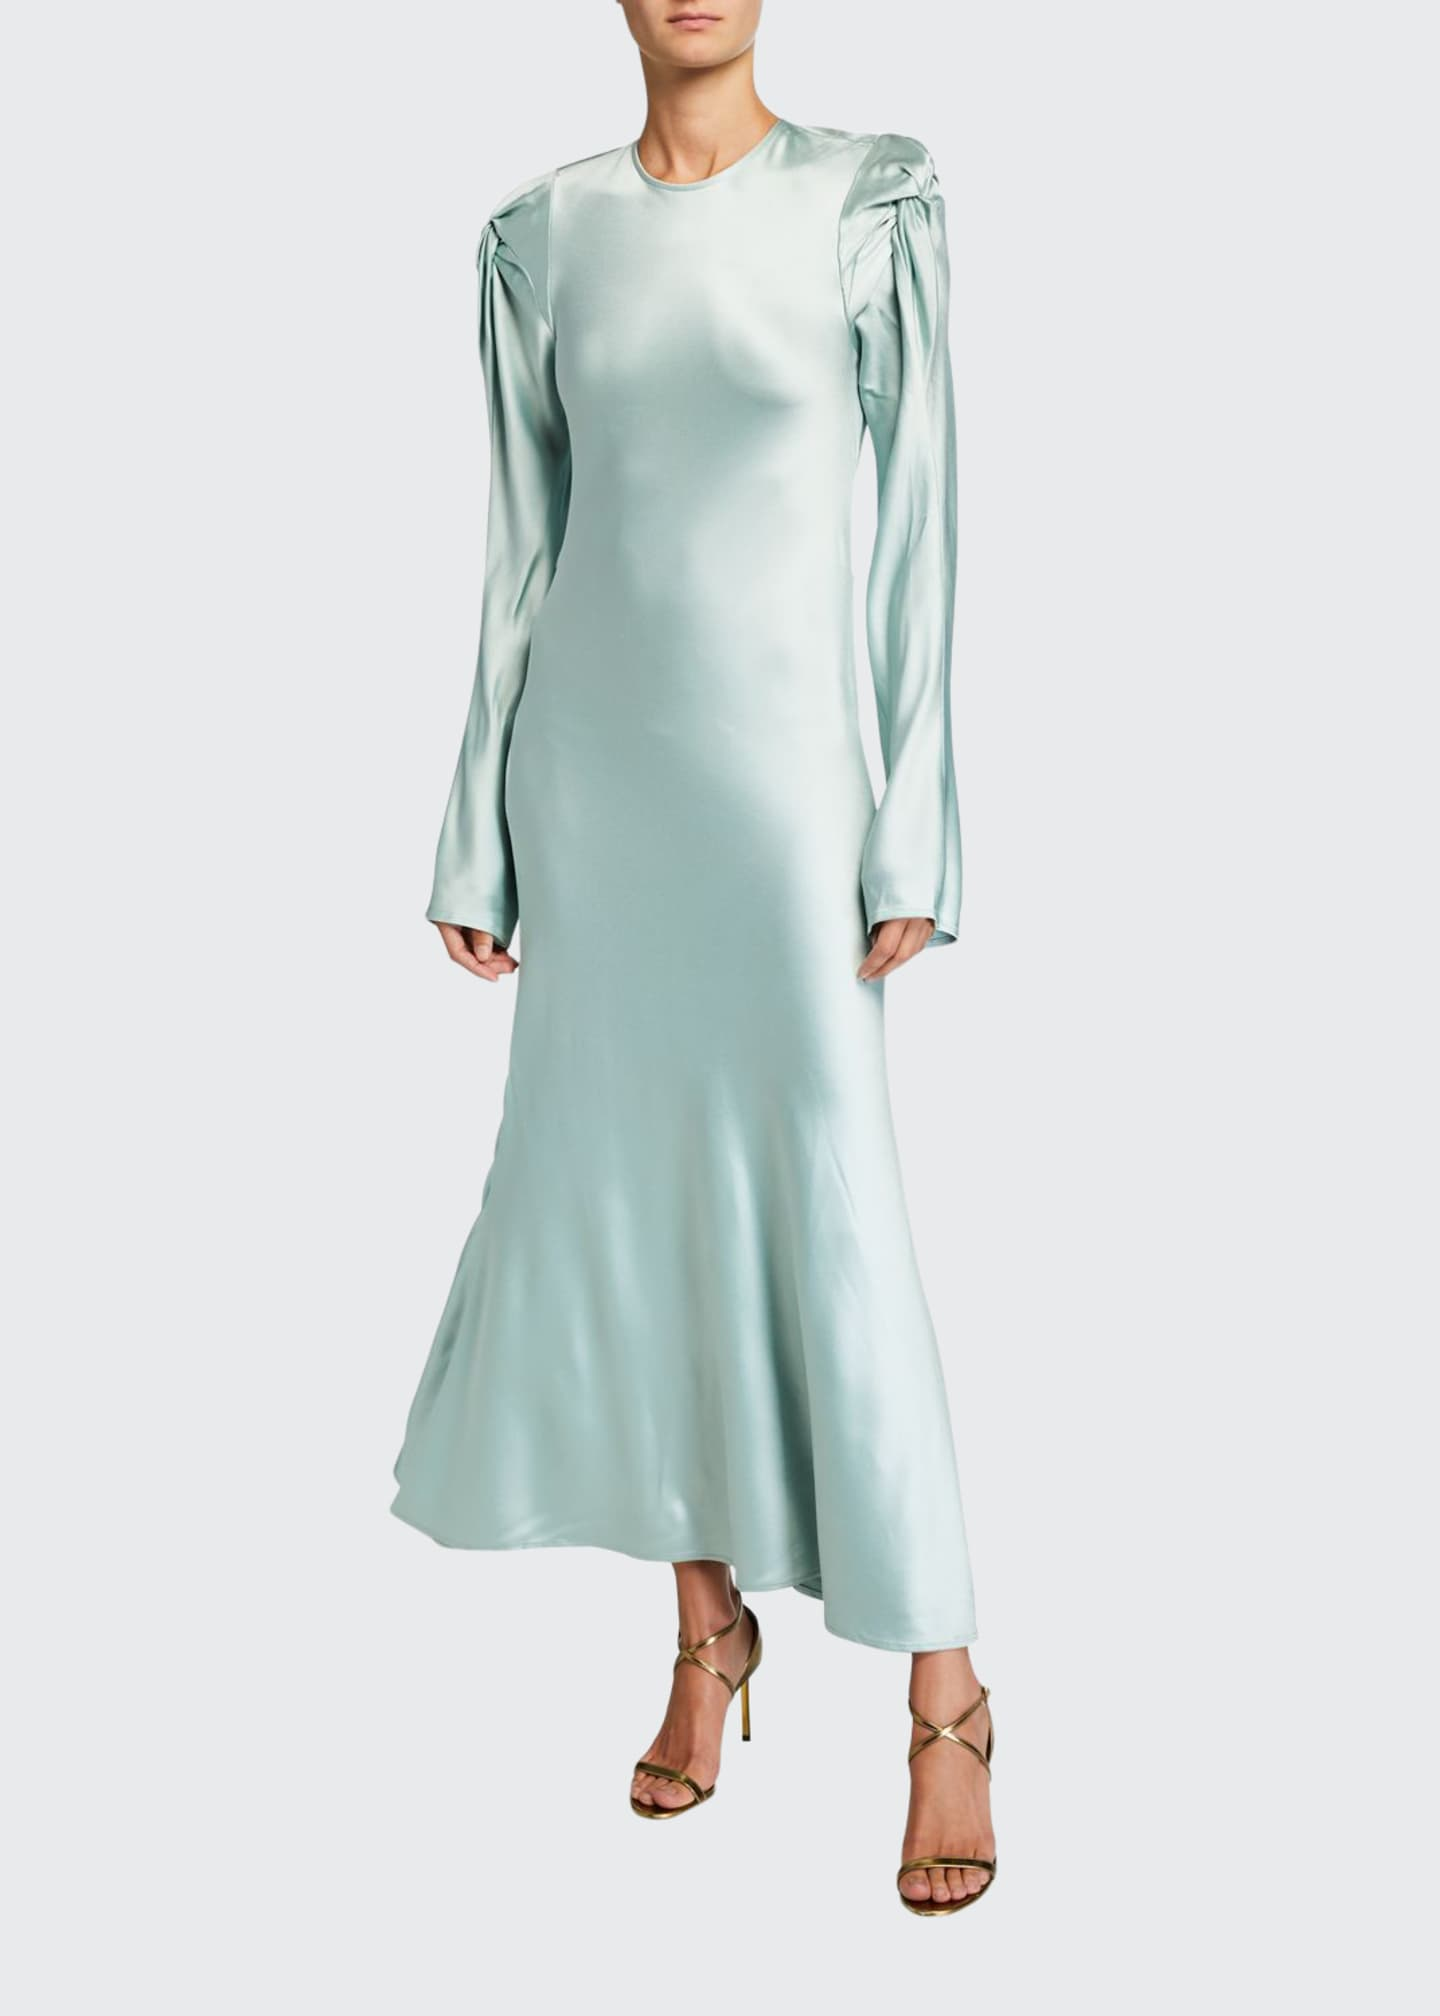 Maggie Marilyn Love Me Knot Satin Long-Sleeve Dress